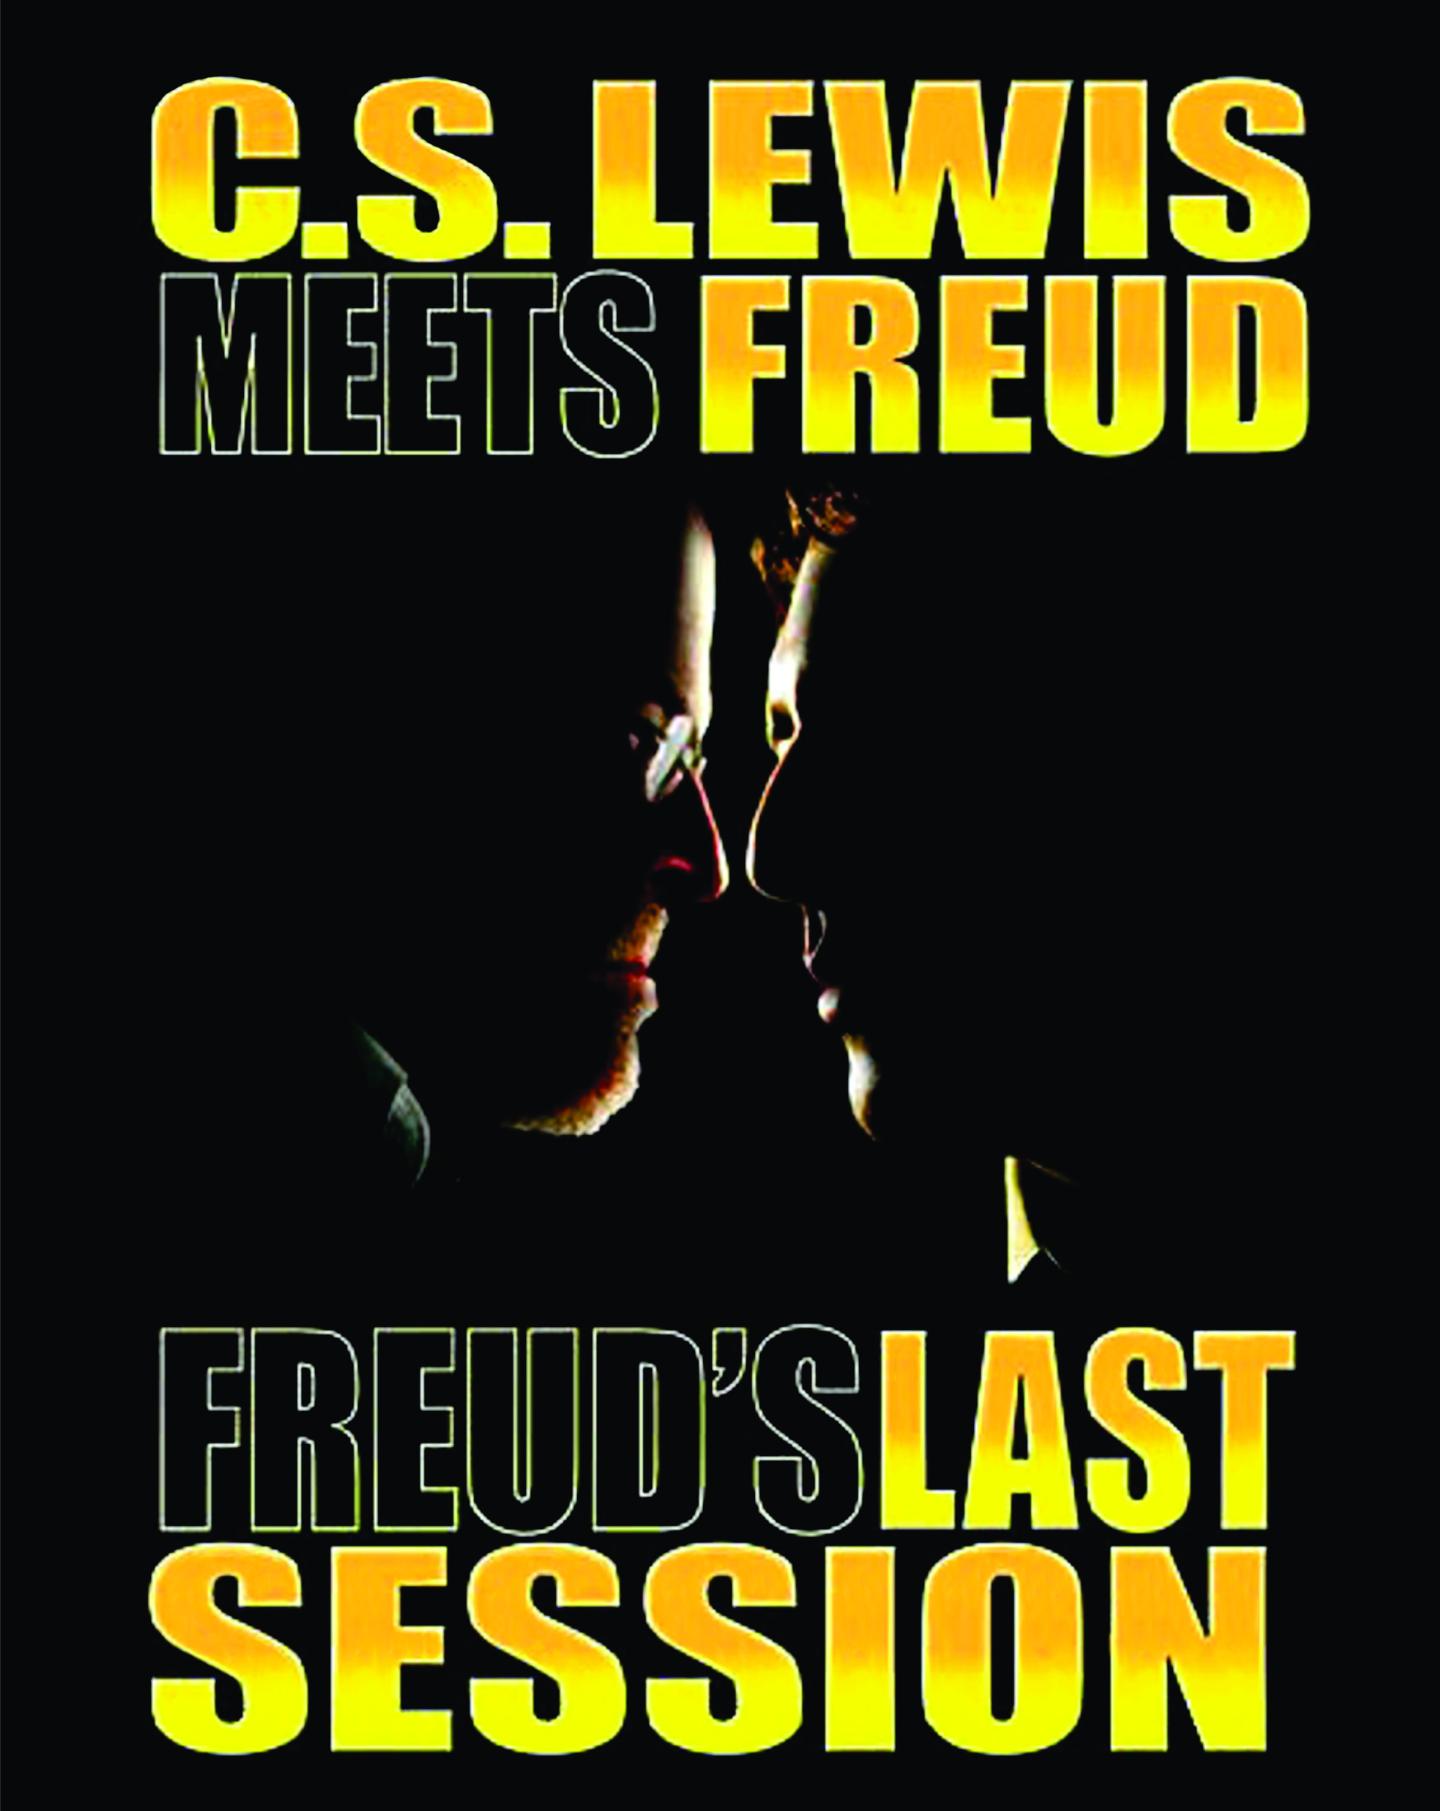 cs lewis_freud